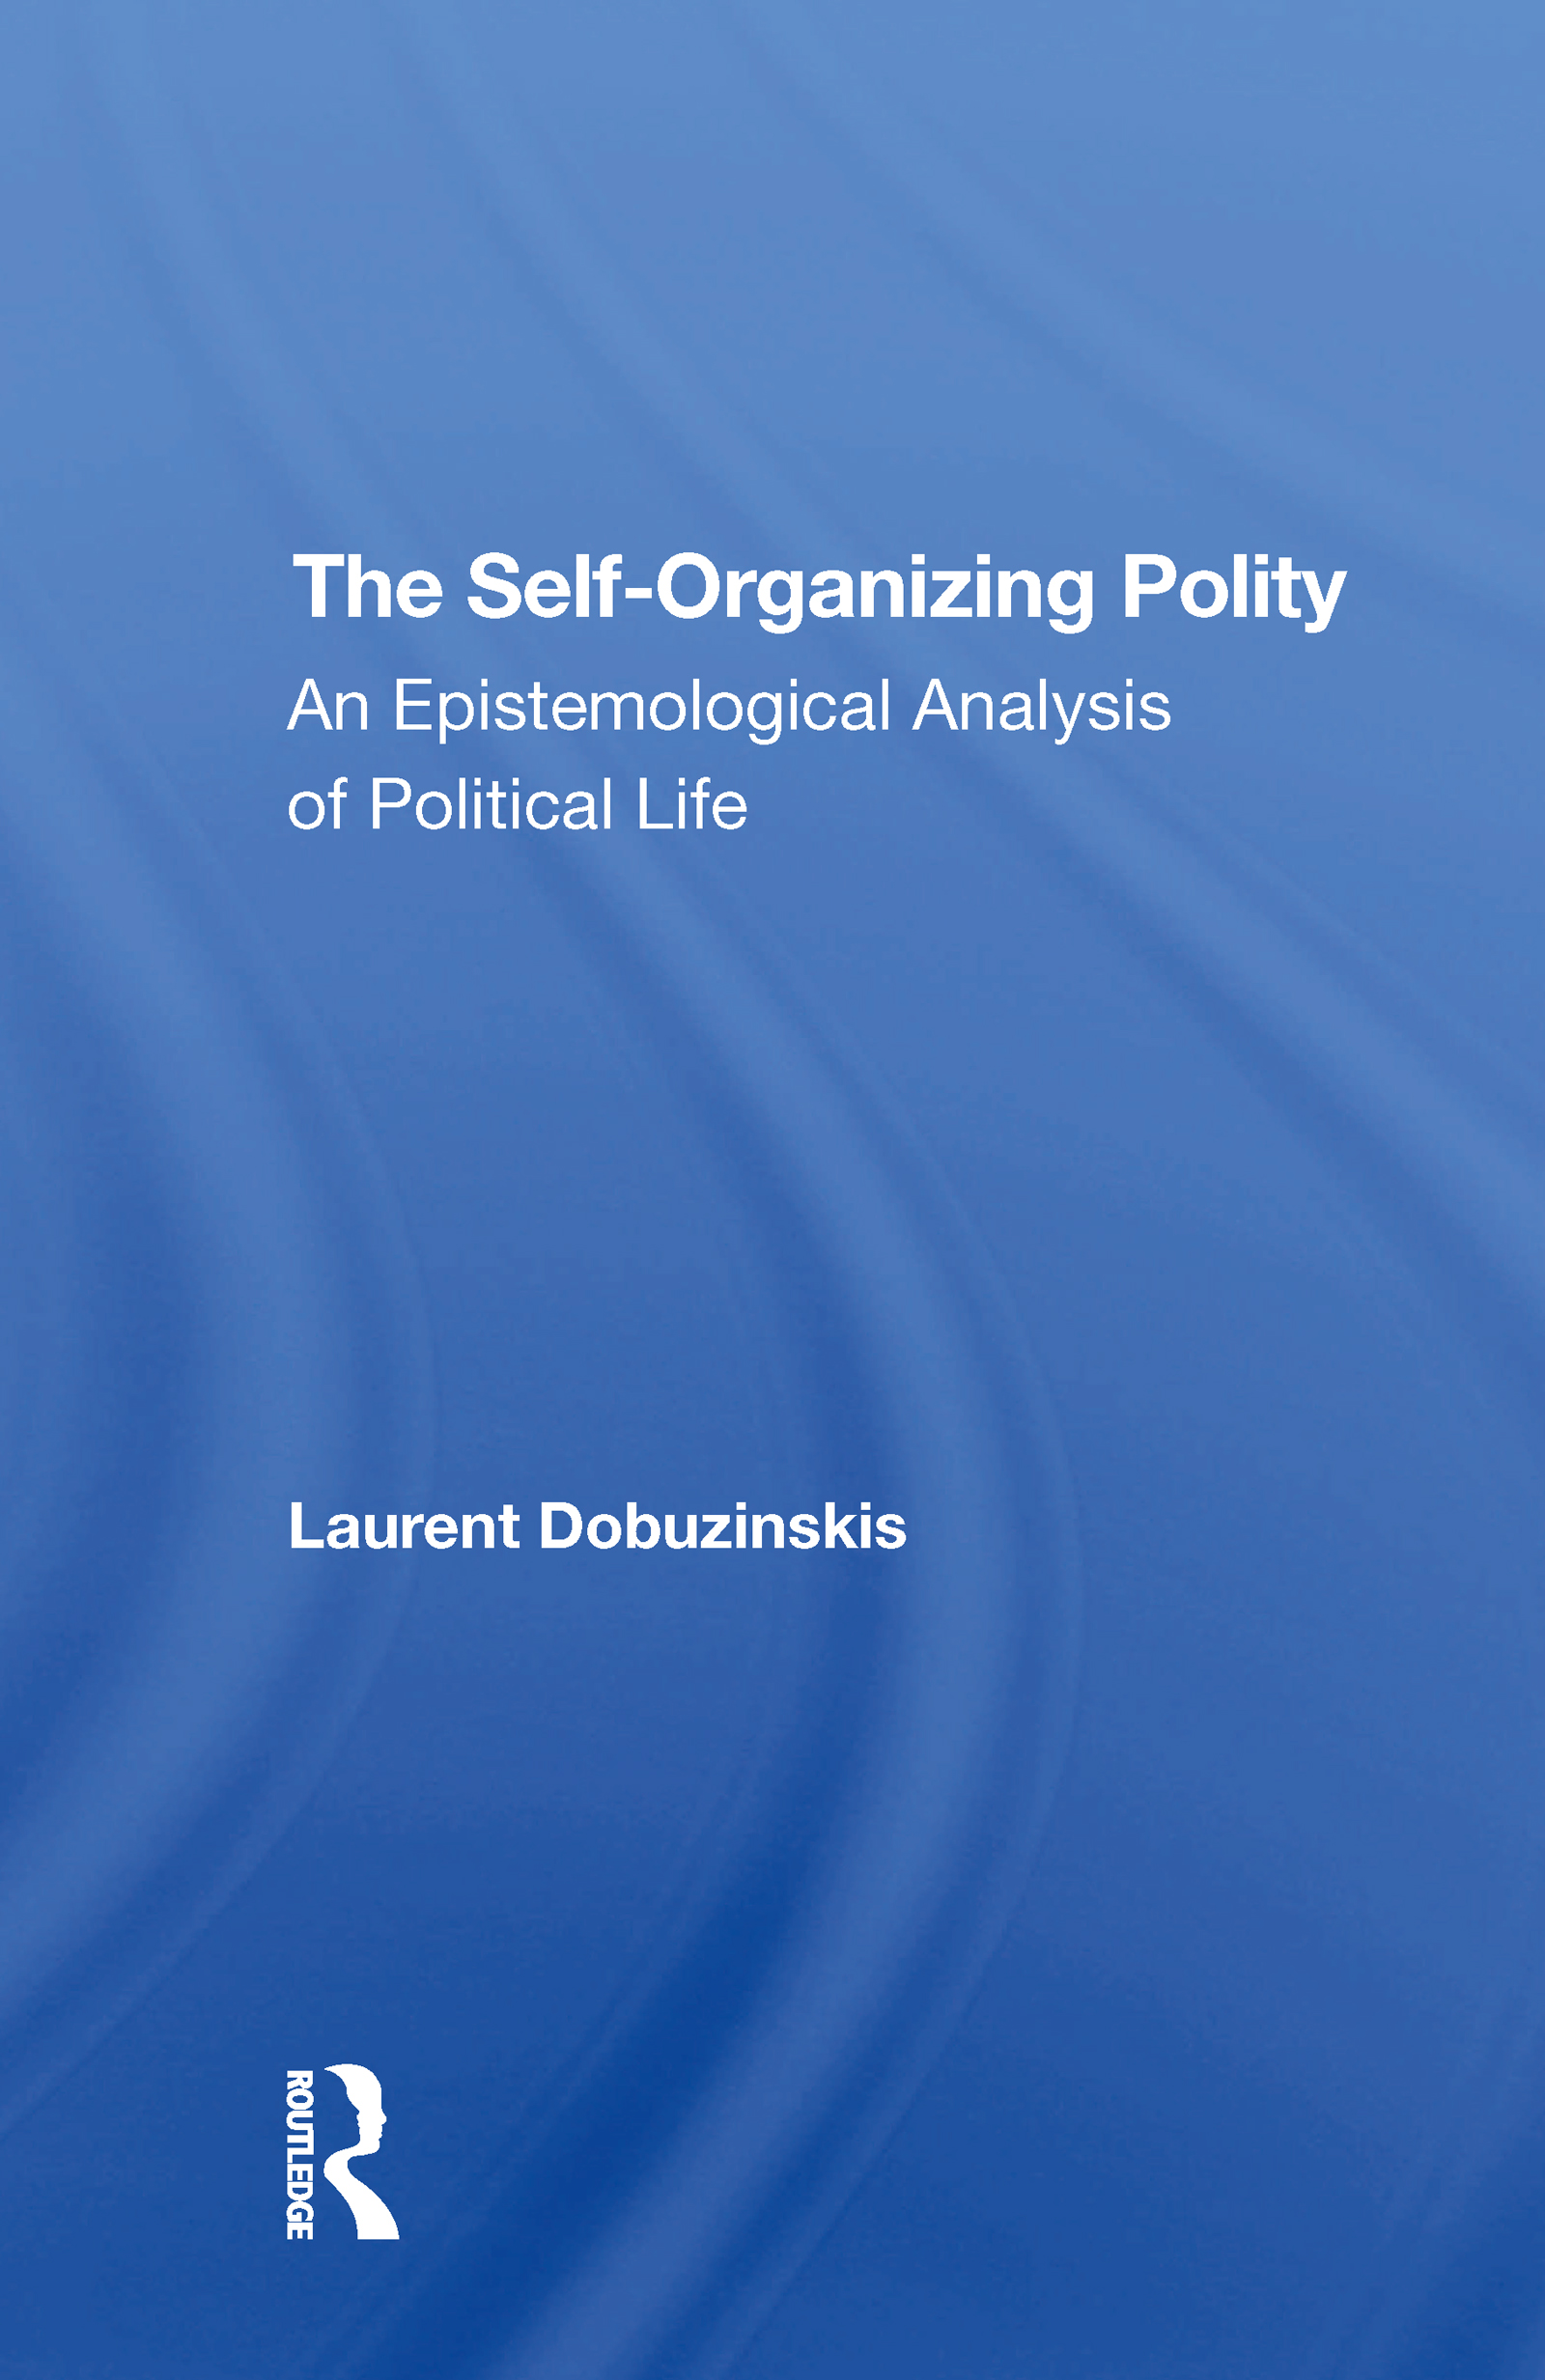 The Self-organizing Polity